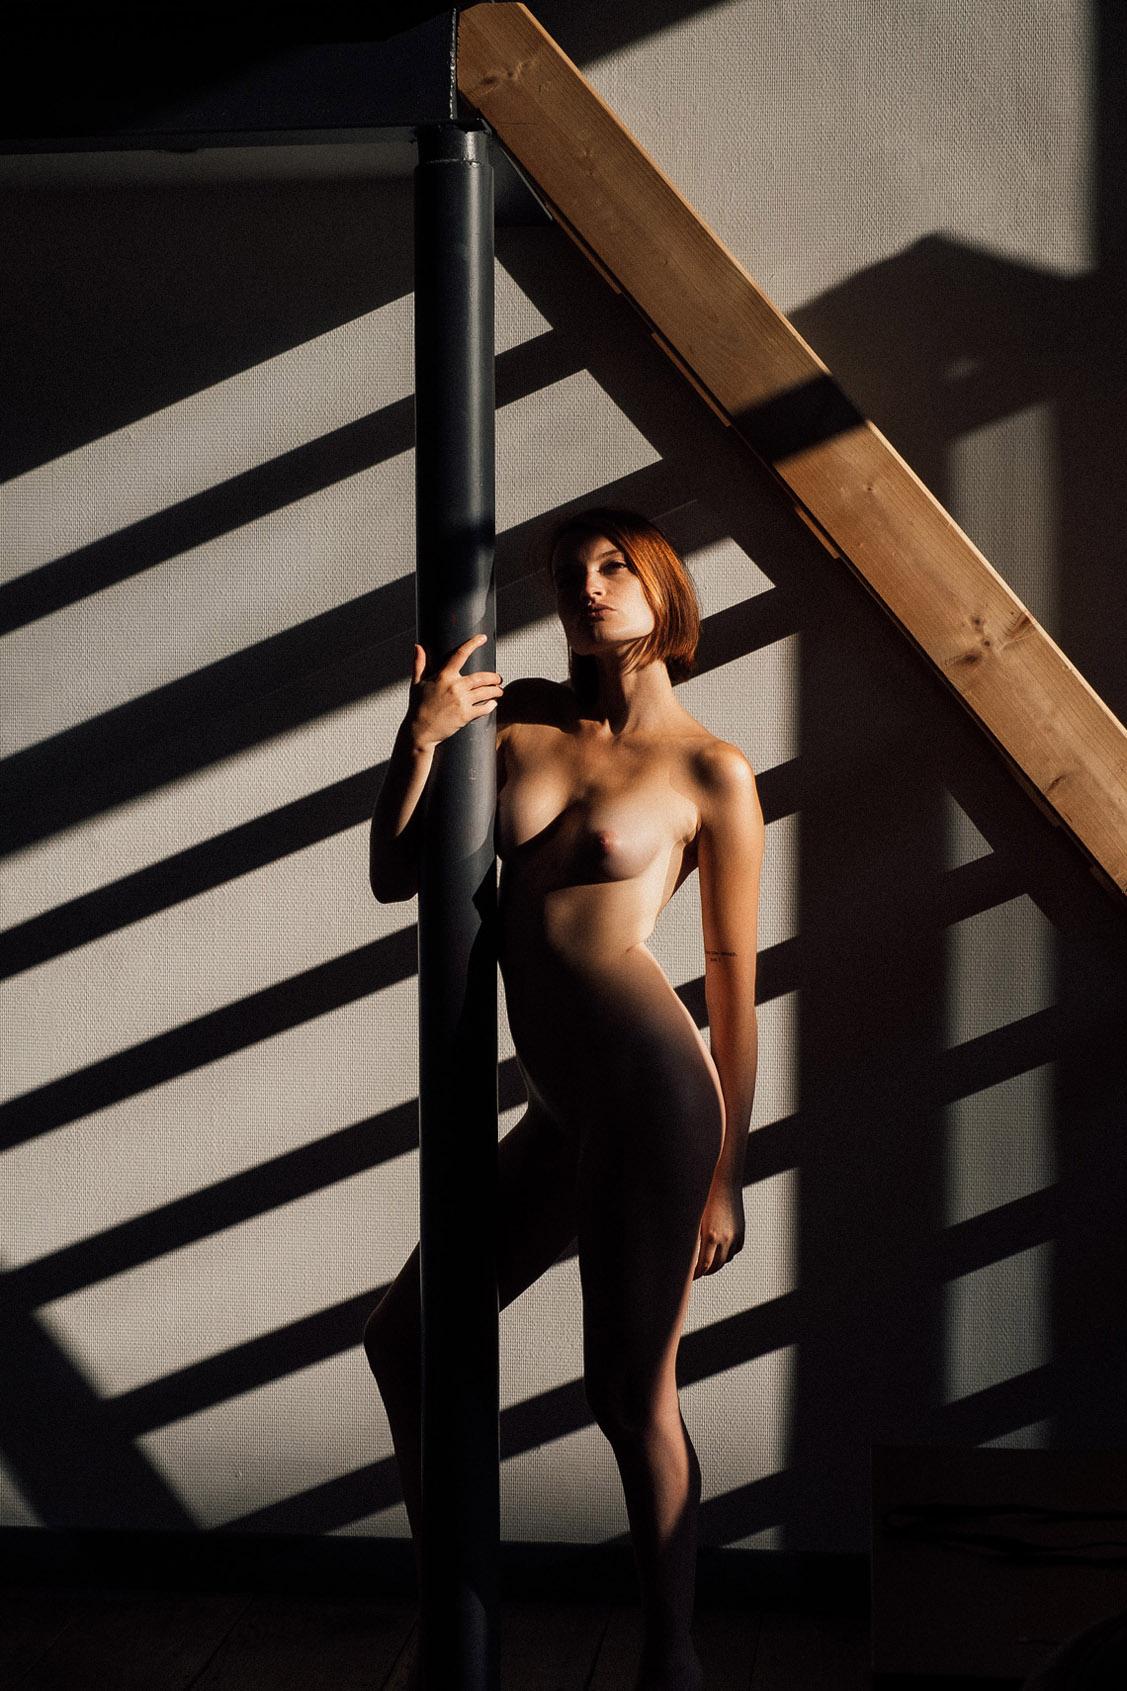 Morning Shadows / Mathilde Wnr by Julien LRVR / Yume Magazine